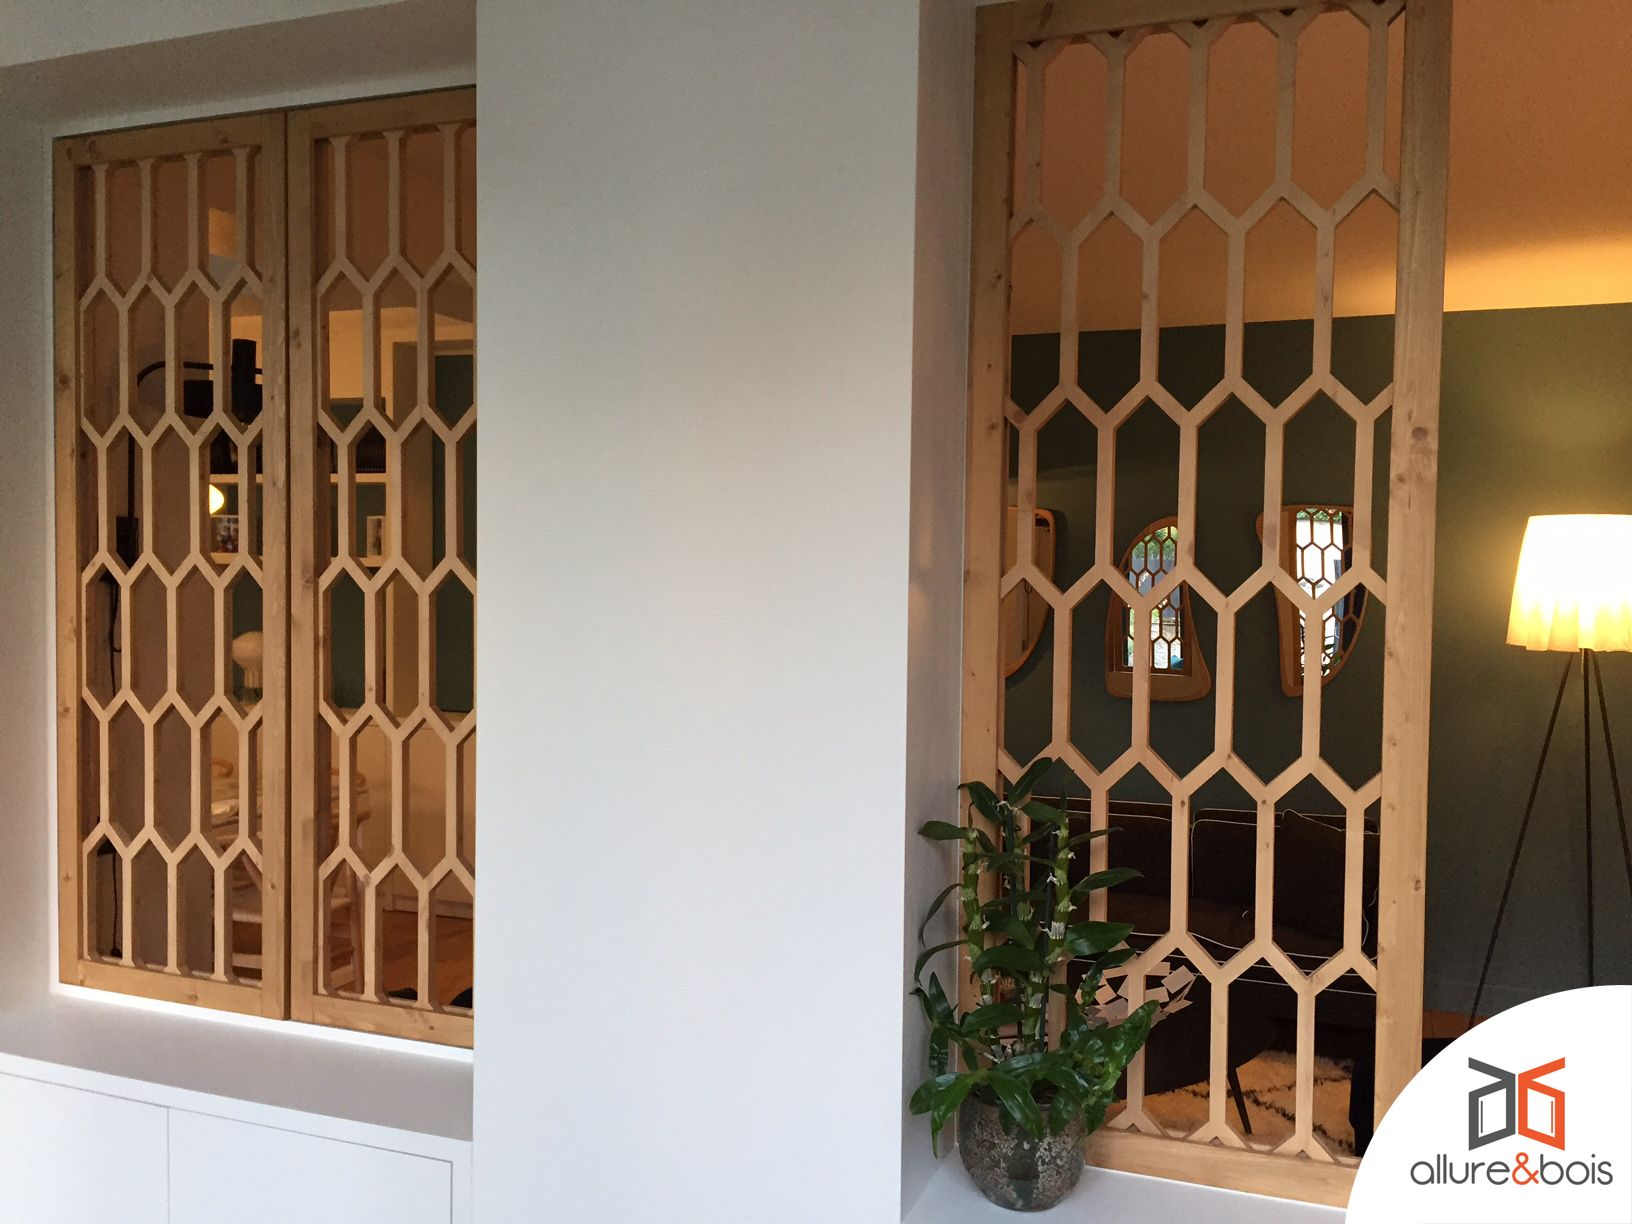 claustra apicula en 2019 claustra en bois claustra. Black Bedroom Furniture Sets. Home Design Ideas